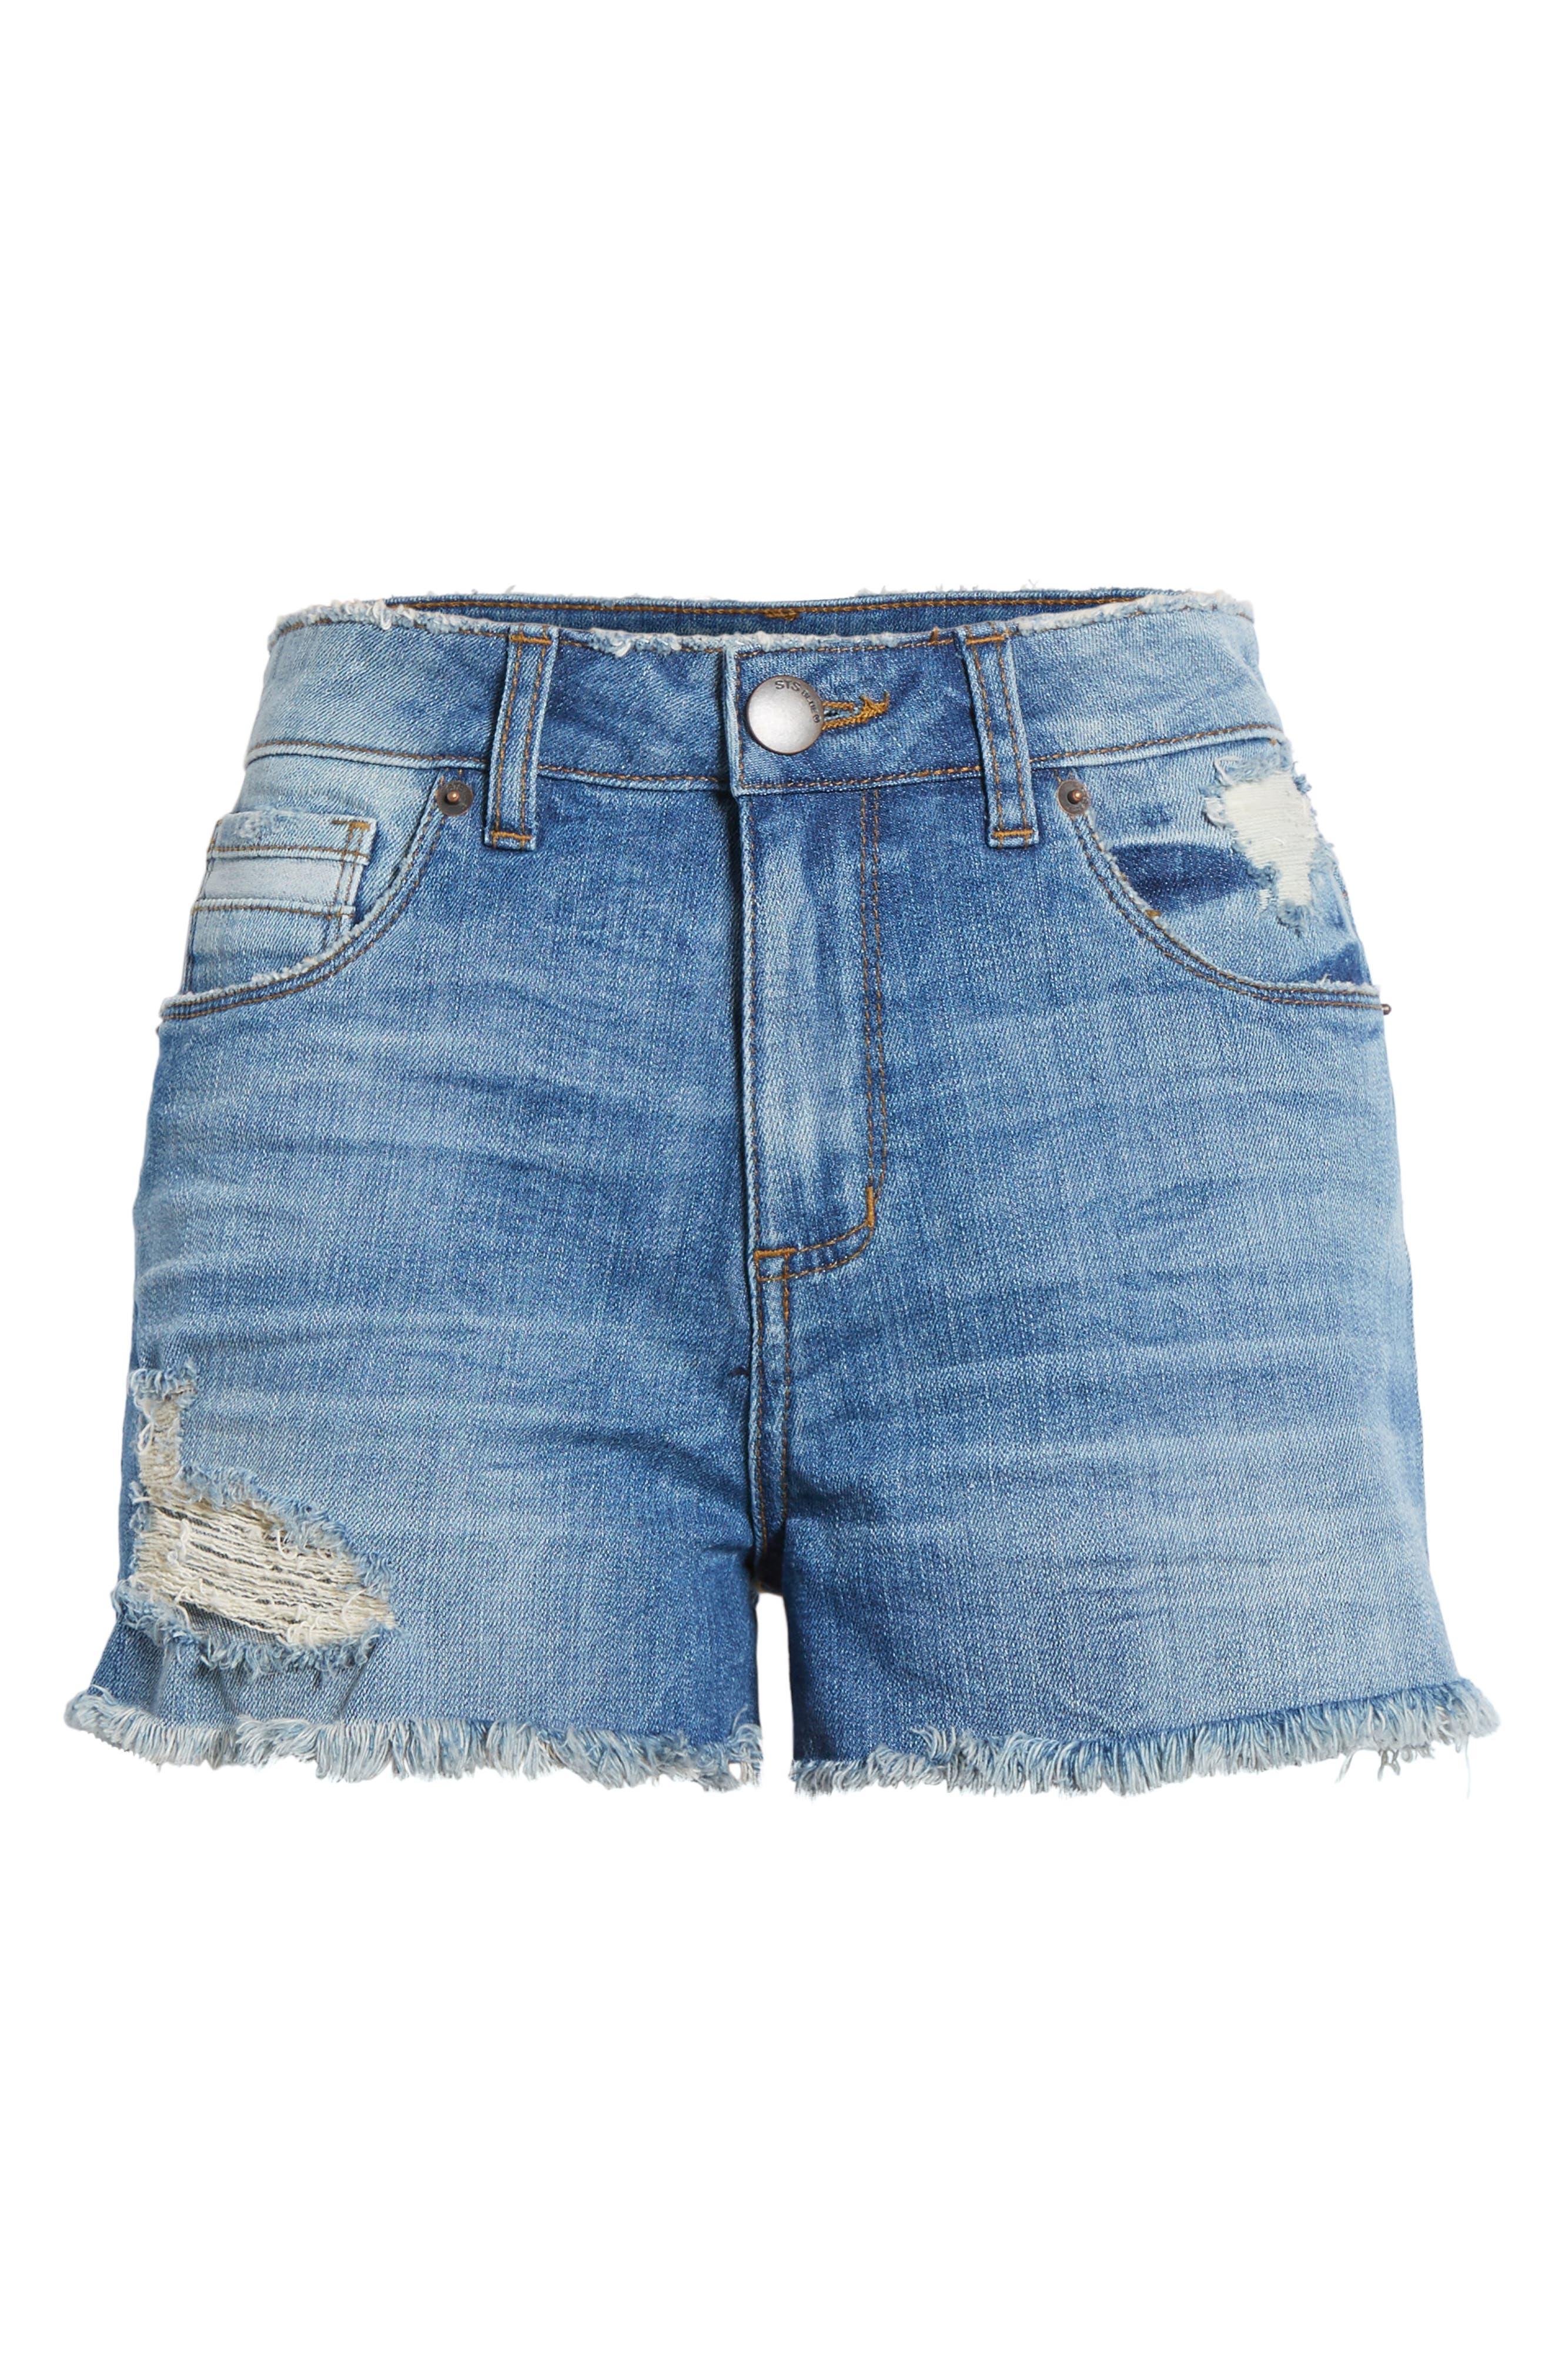 Rosebowl Shadow Pocket Denim Shorts,                             Alternate thumbnail 7, color,                             403